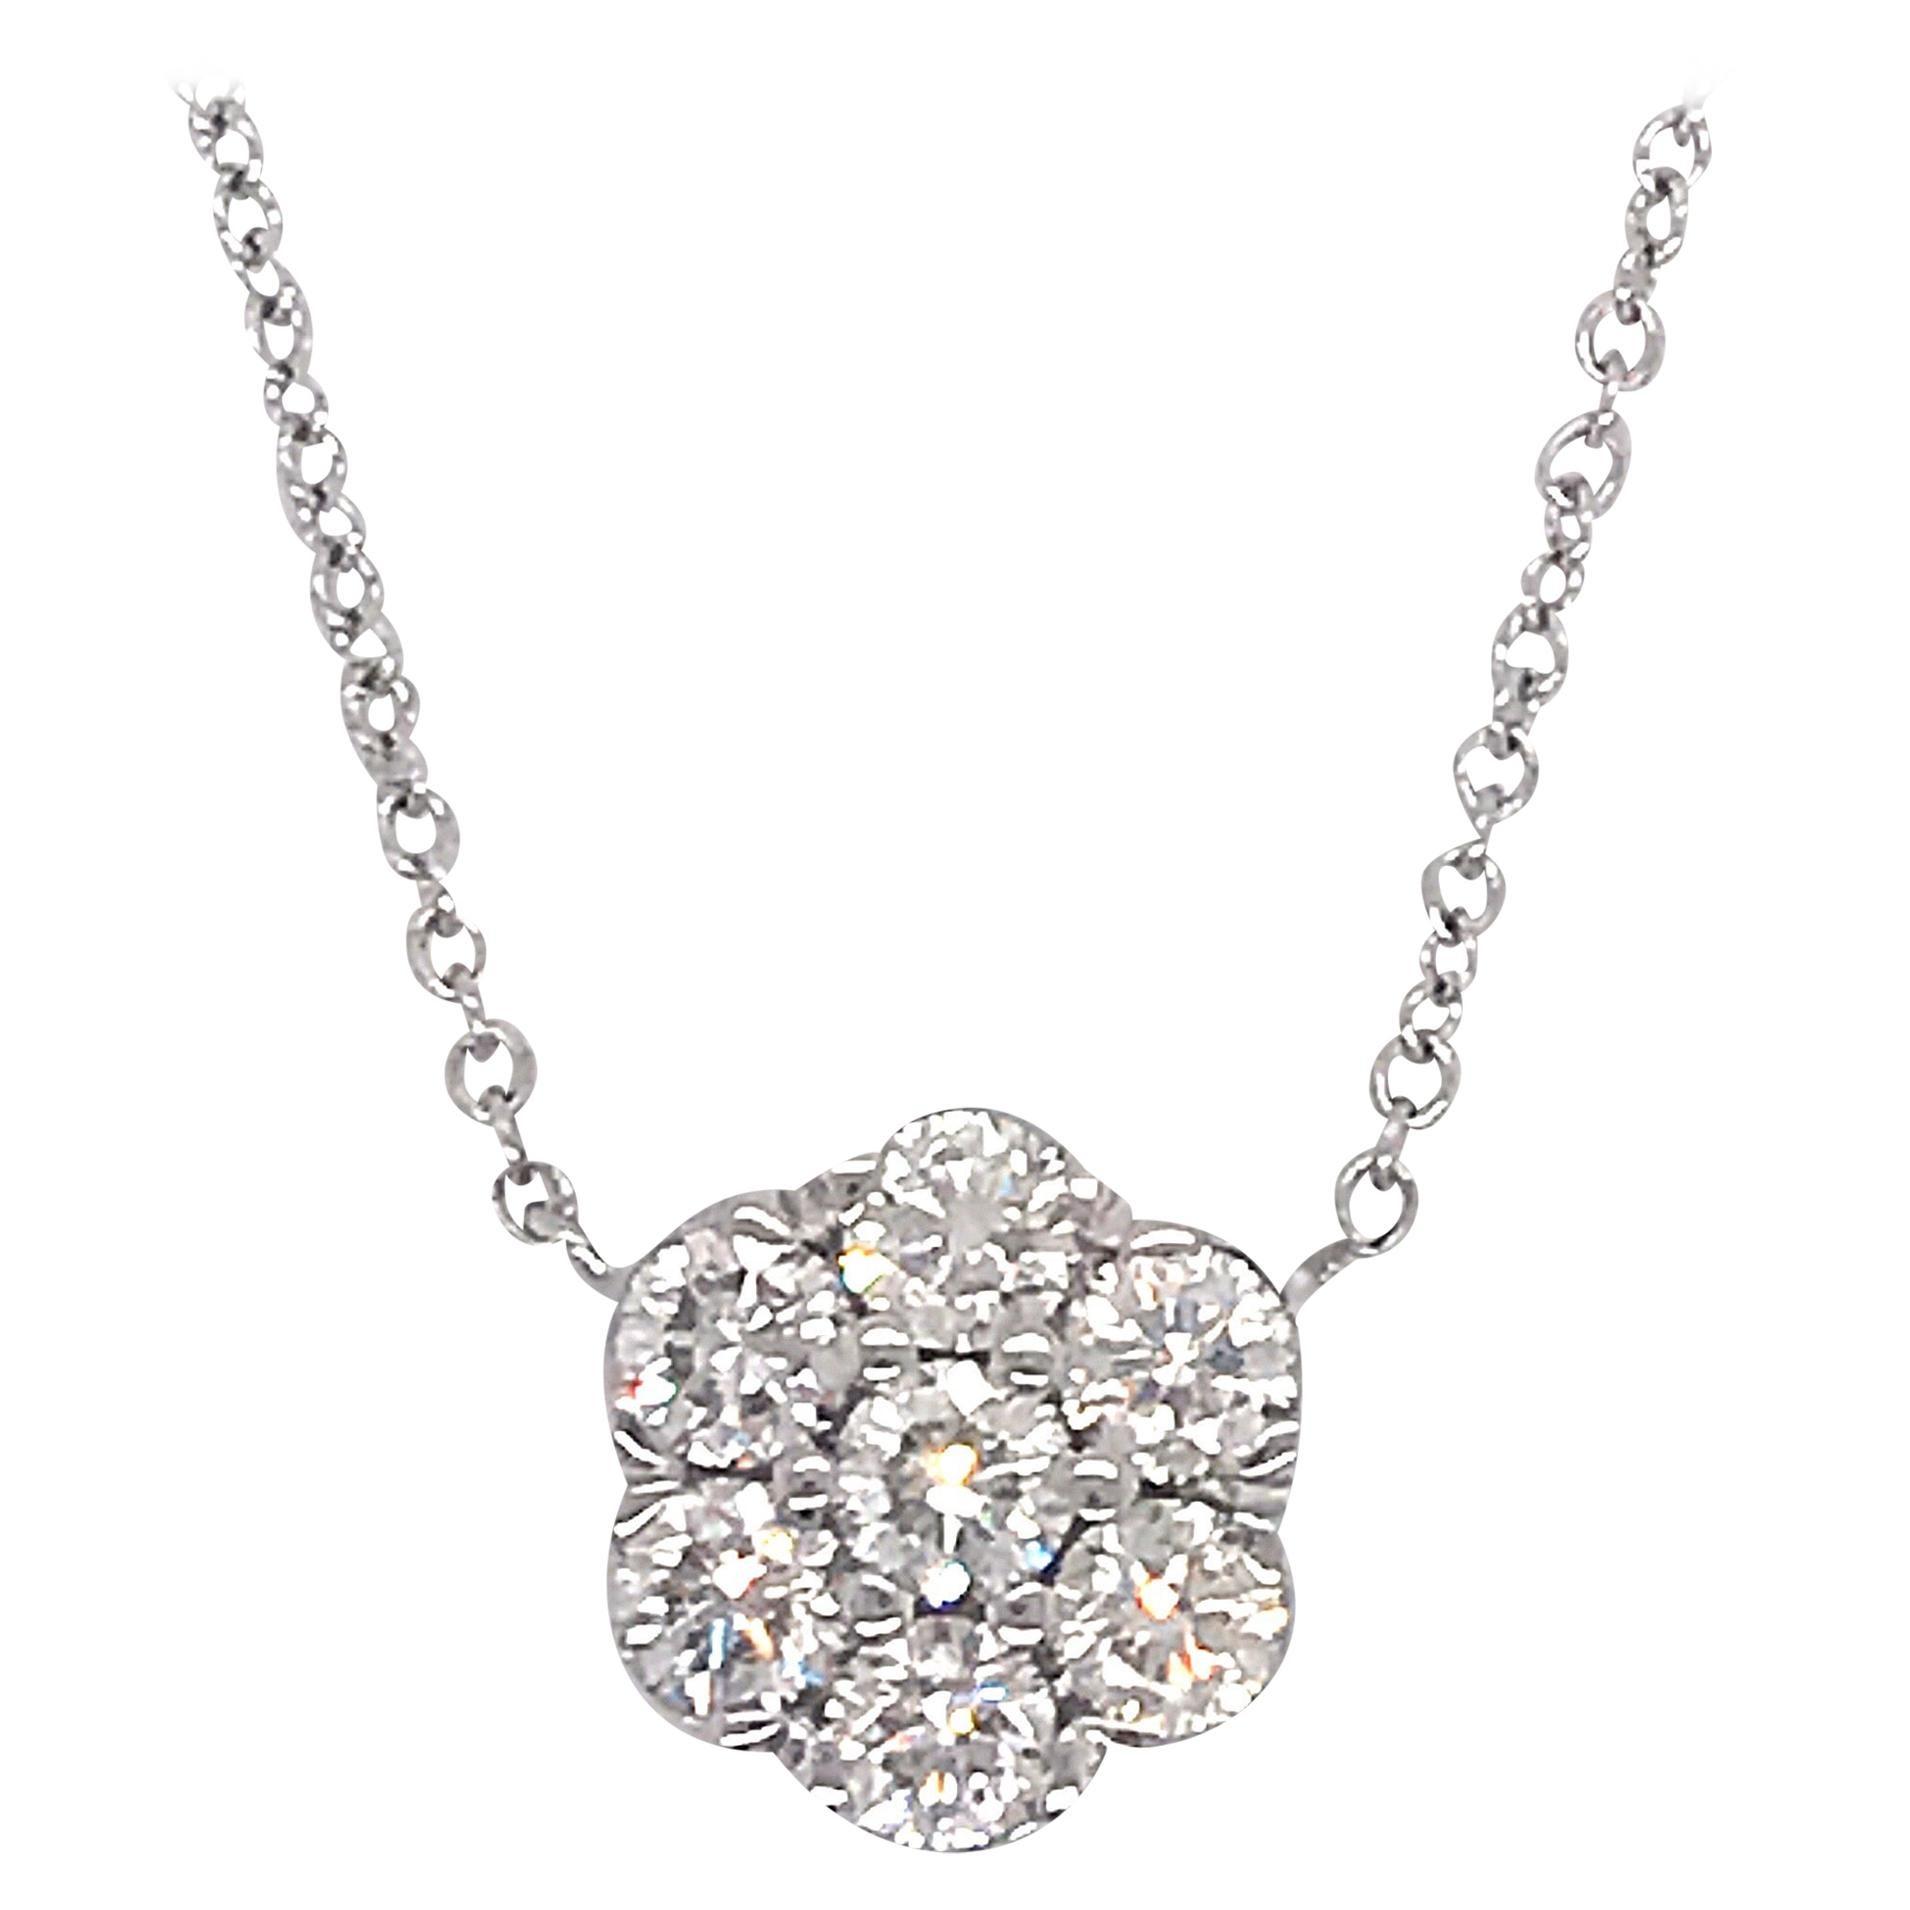 Diamond Floral Cluster Pendant 1.04 Carat 18 Karat White Gold